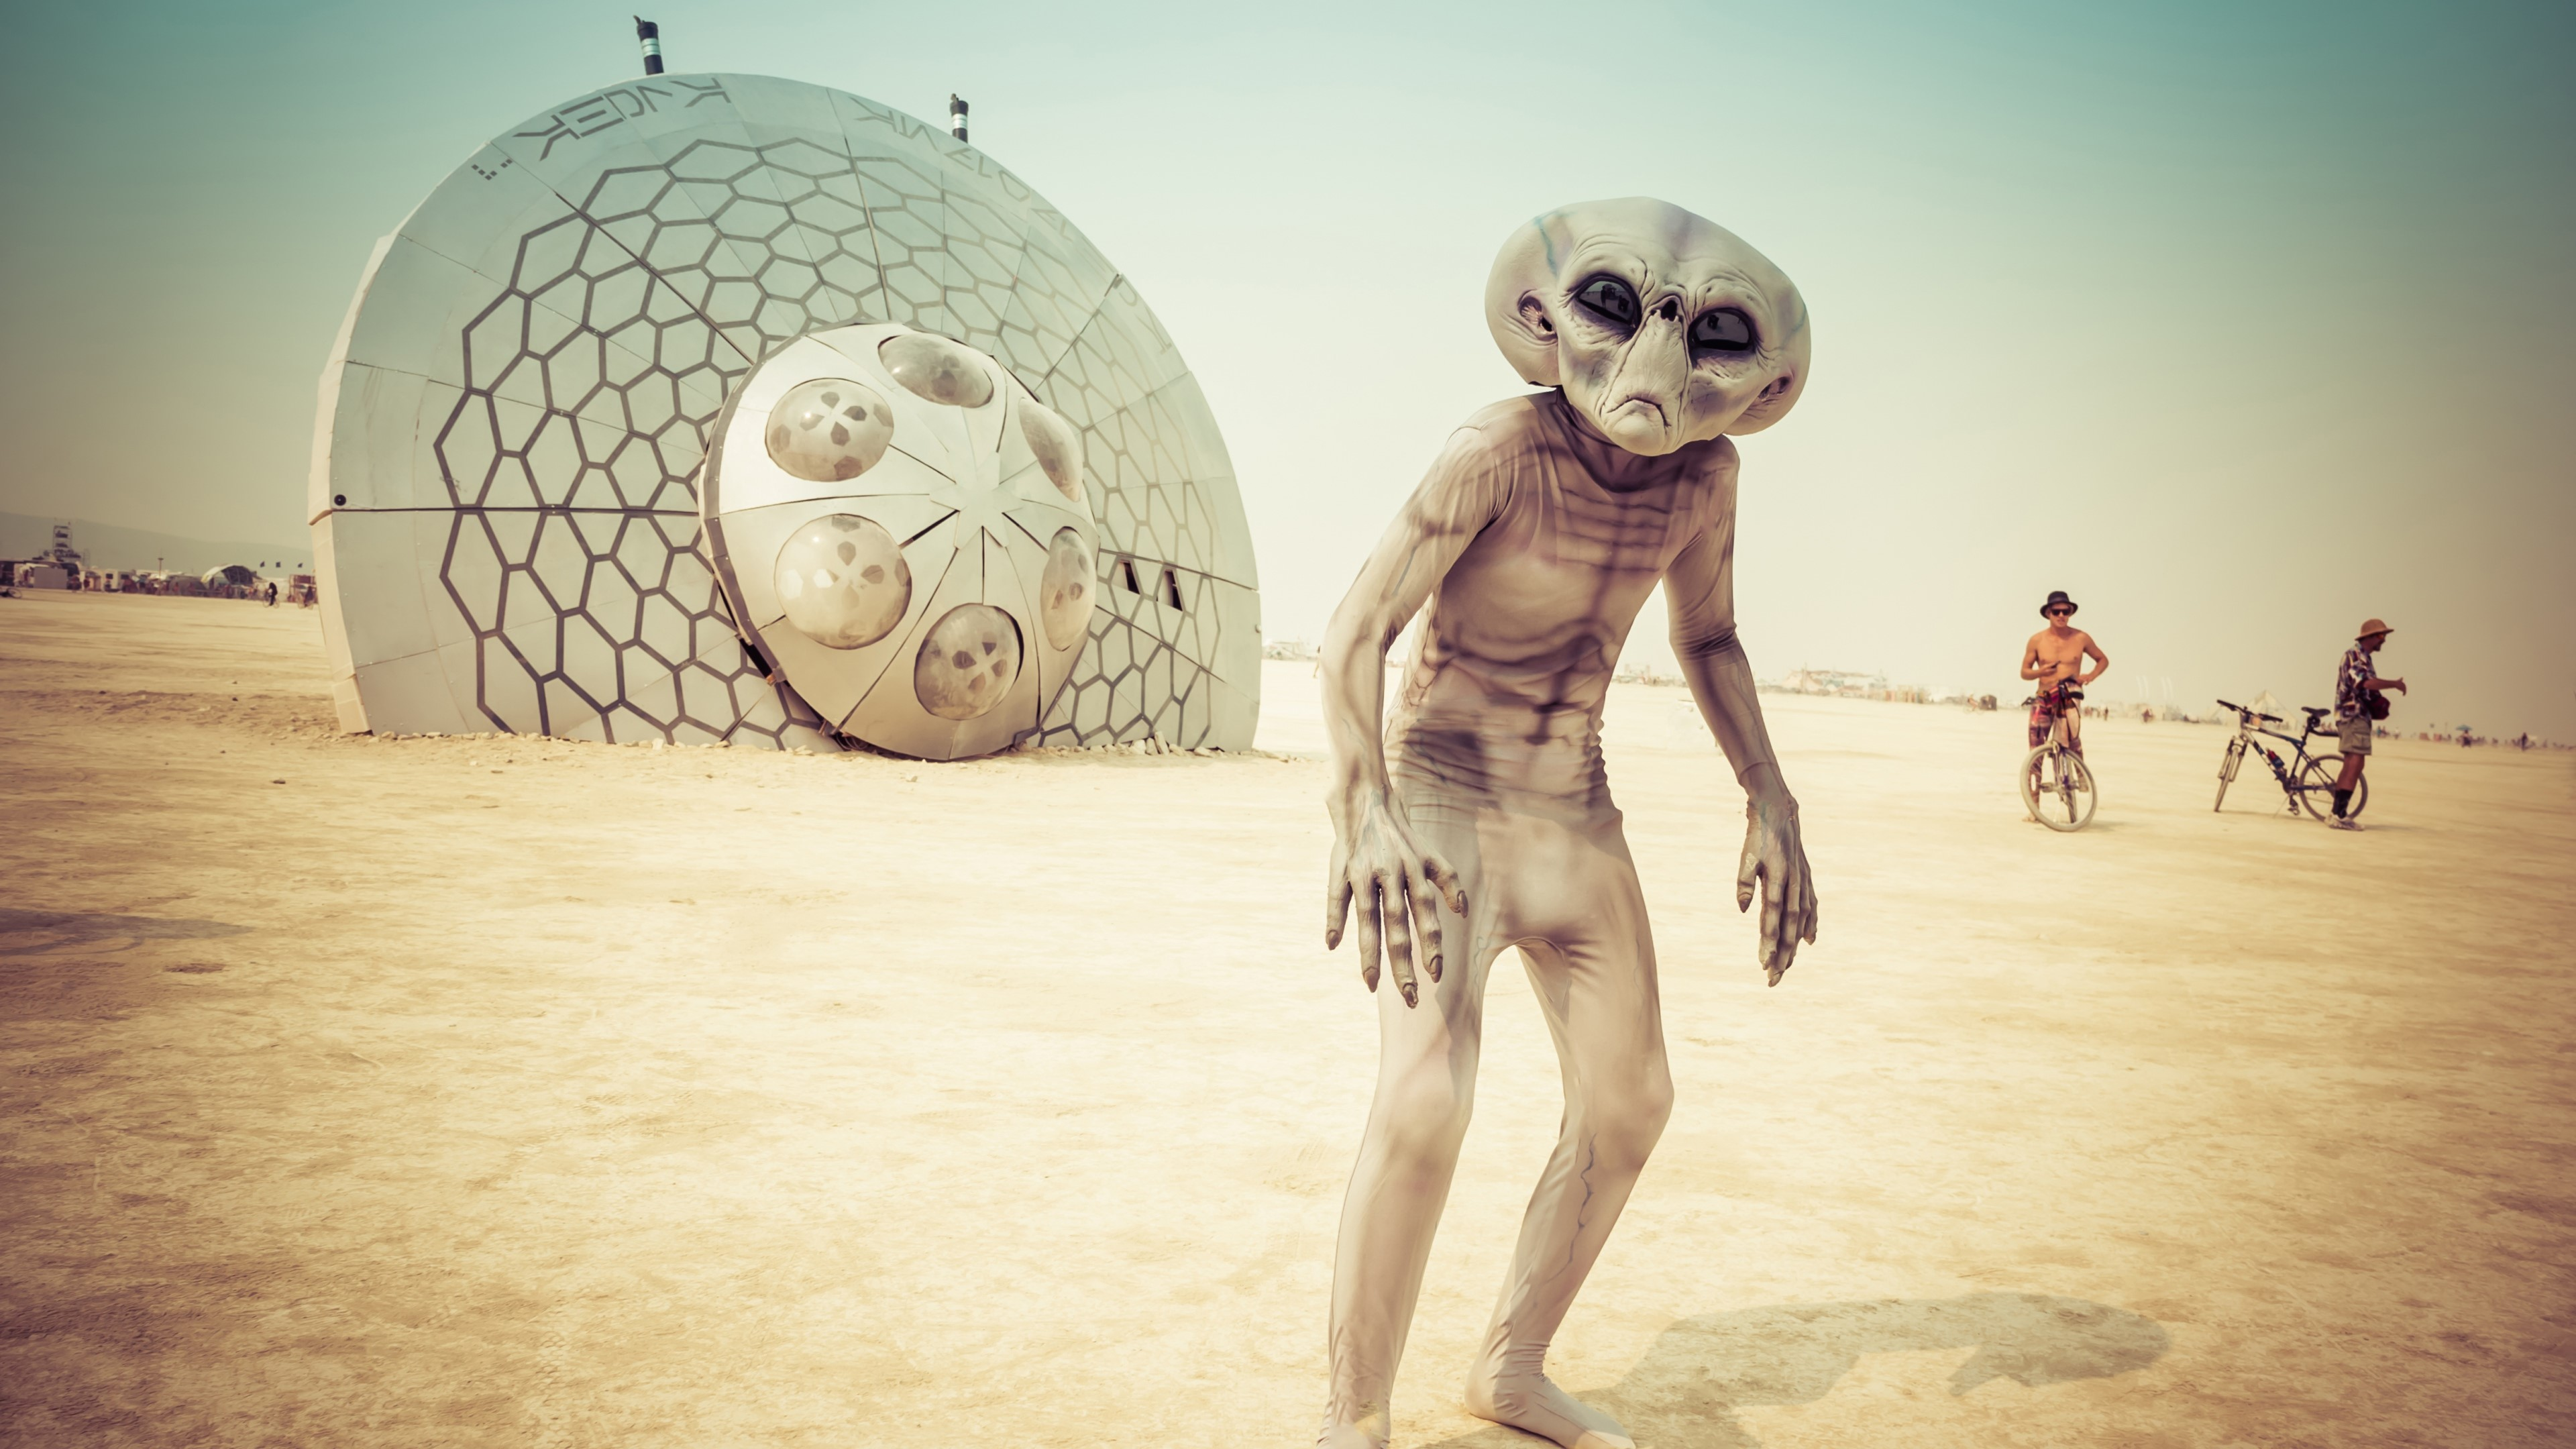 Wallpaper Alien in Nevada